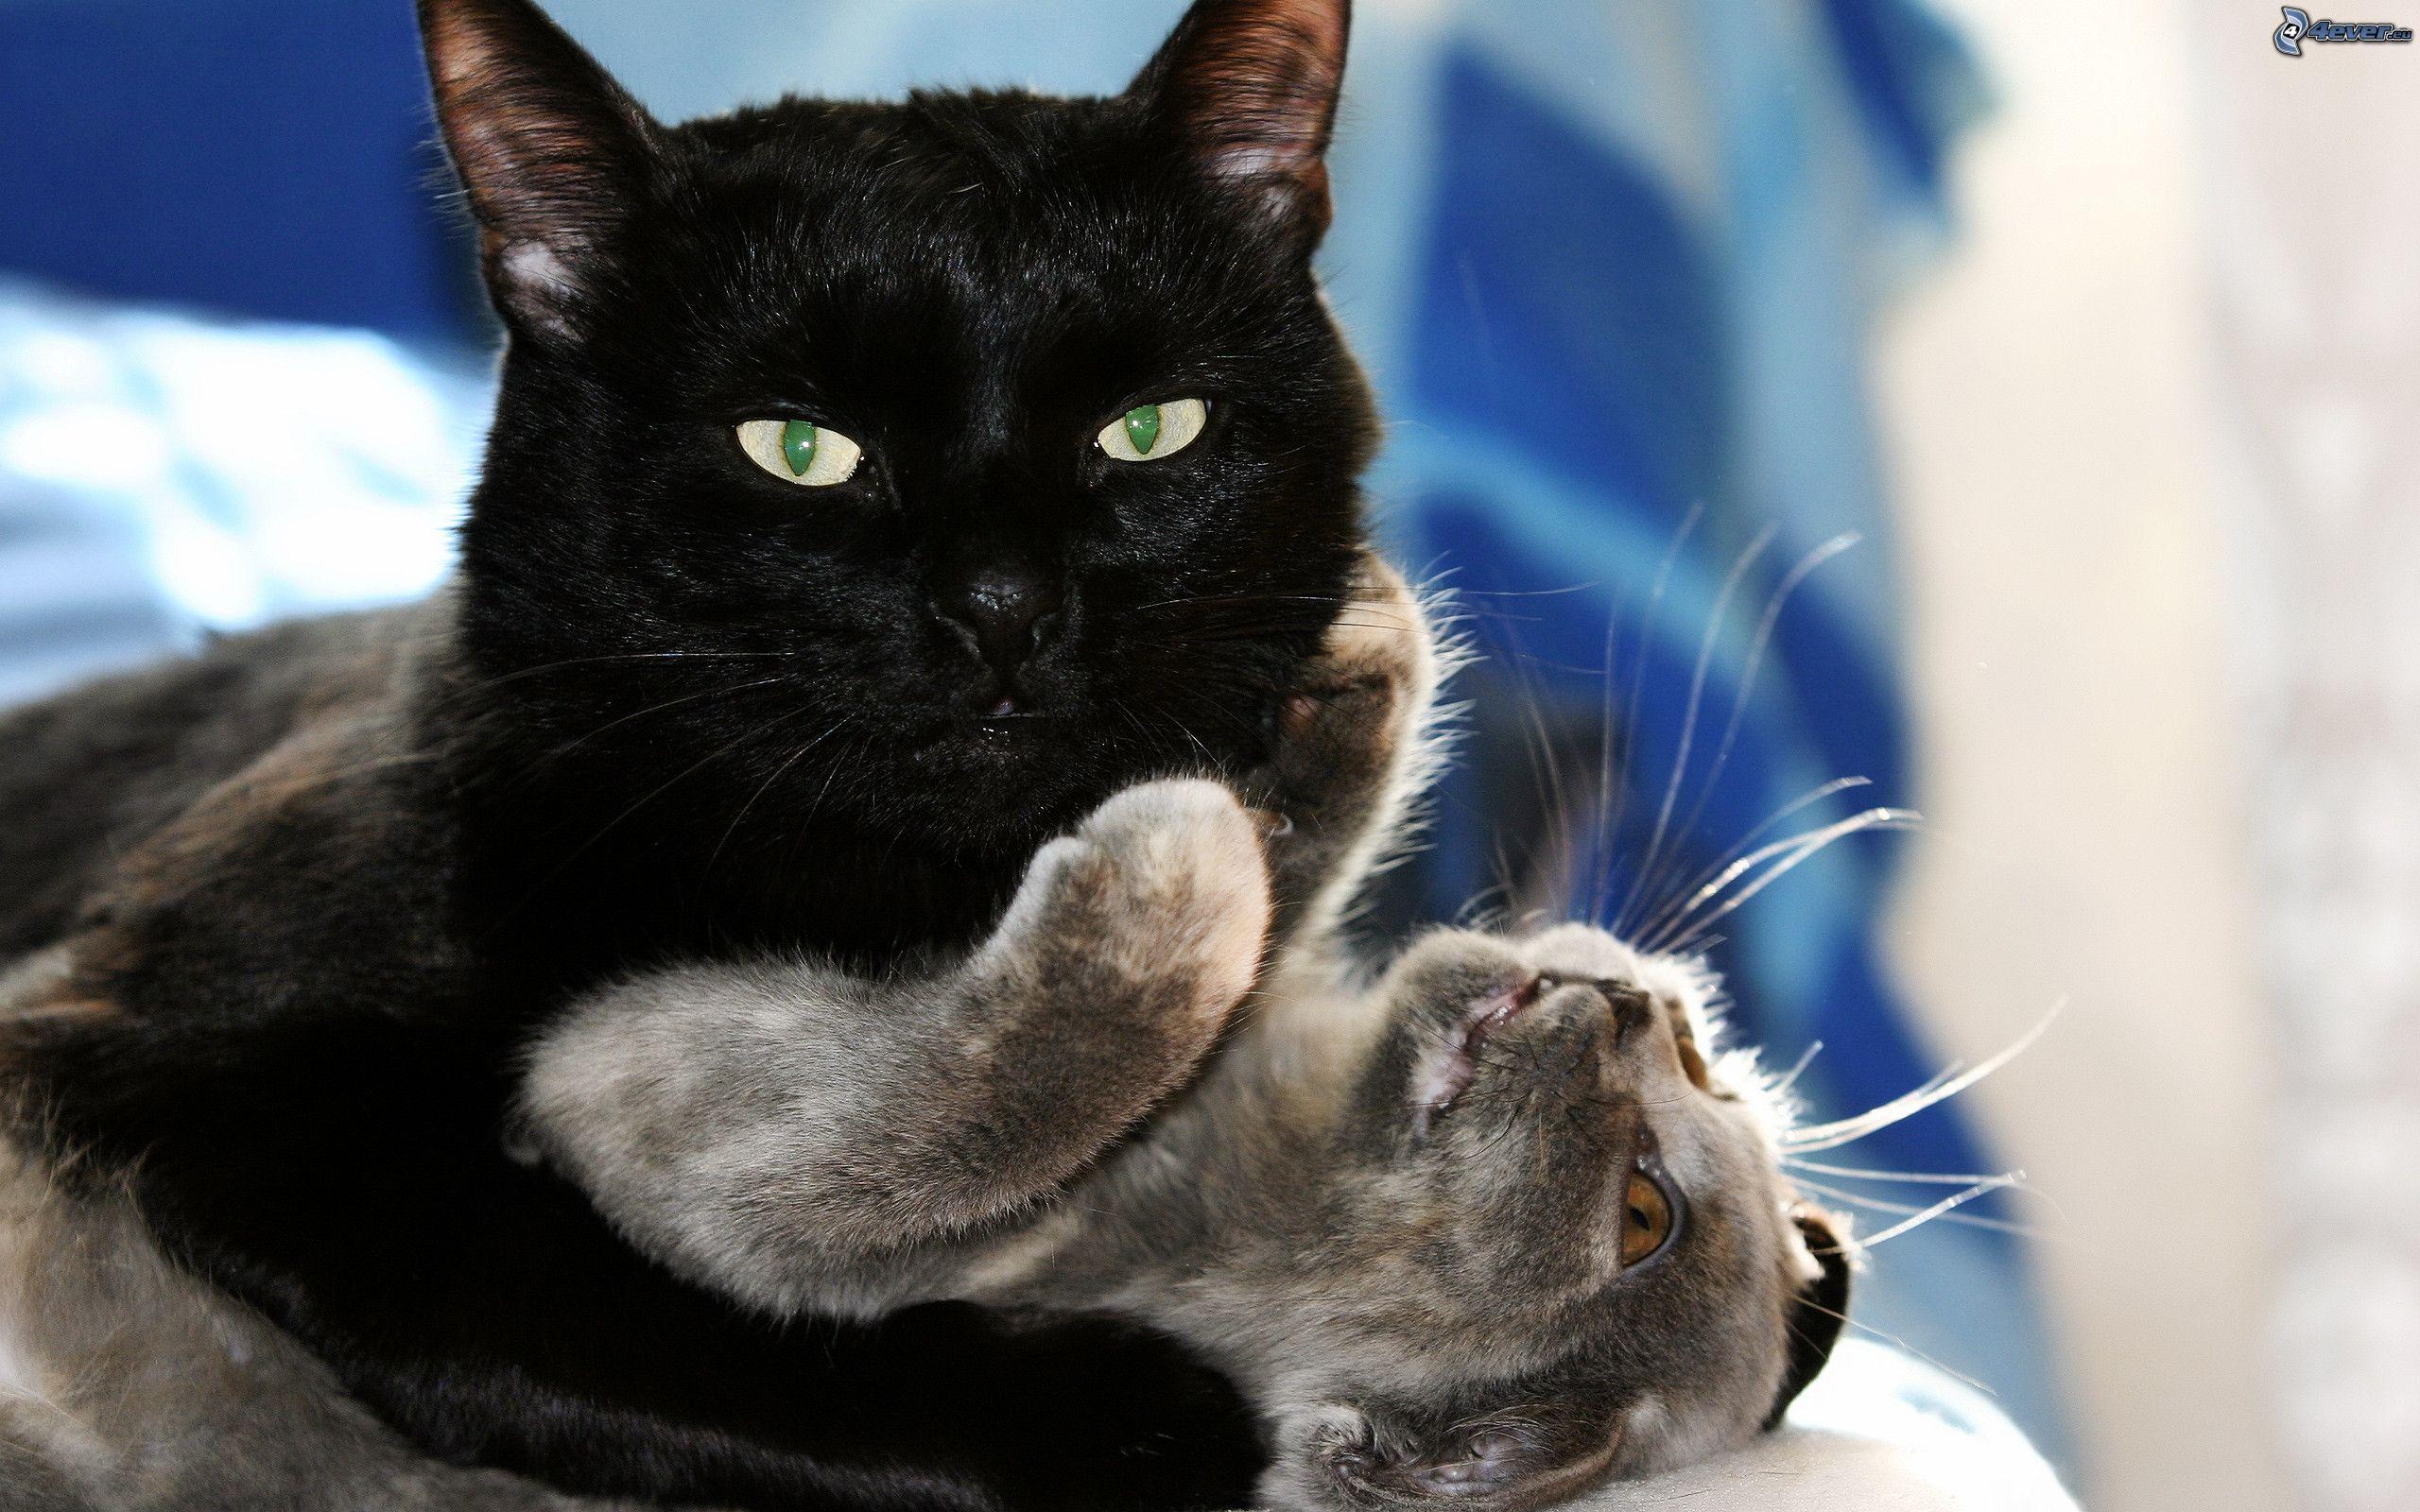 Gran gatito negro gordo